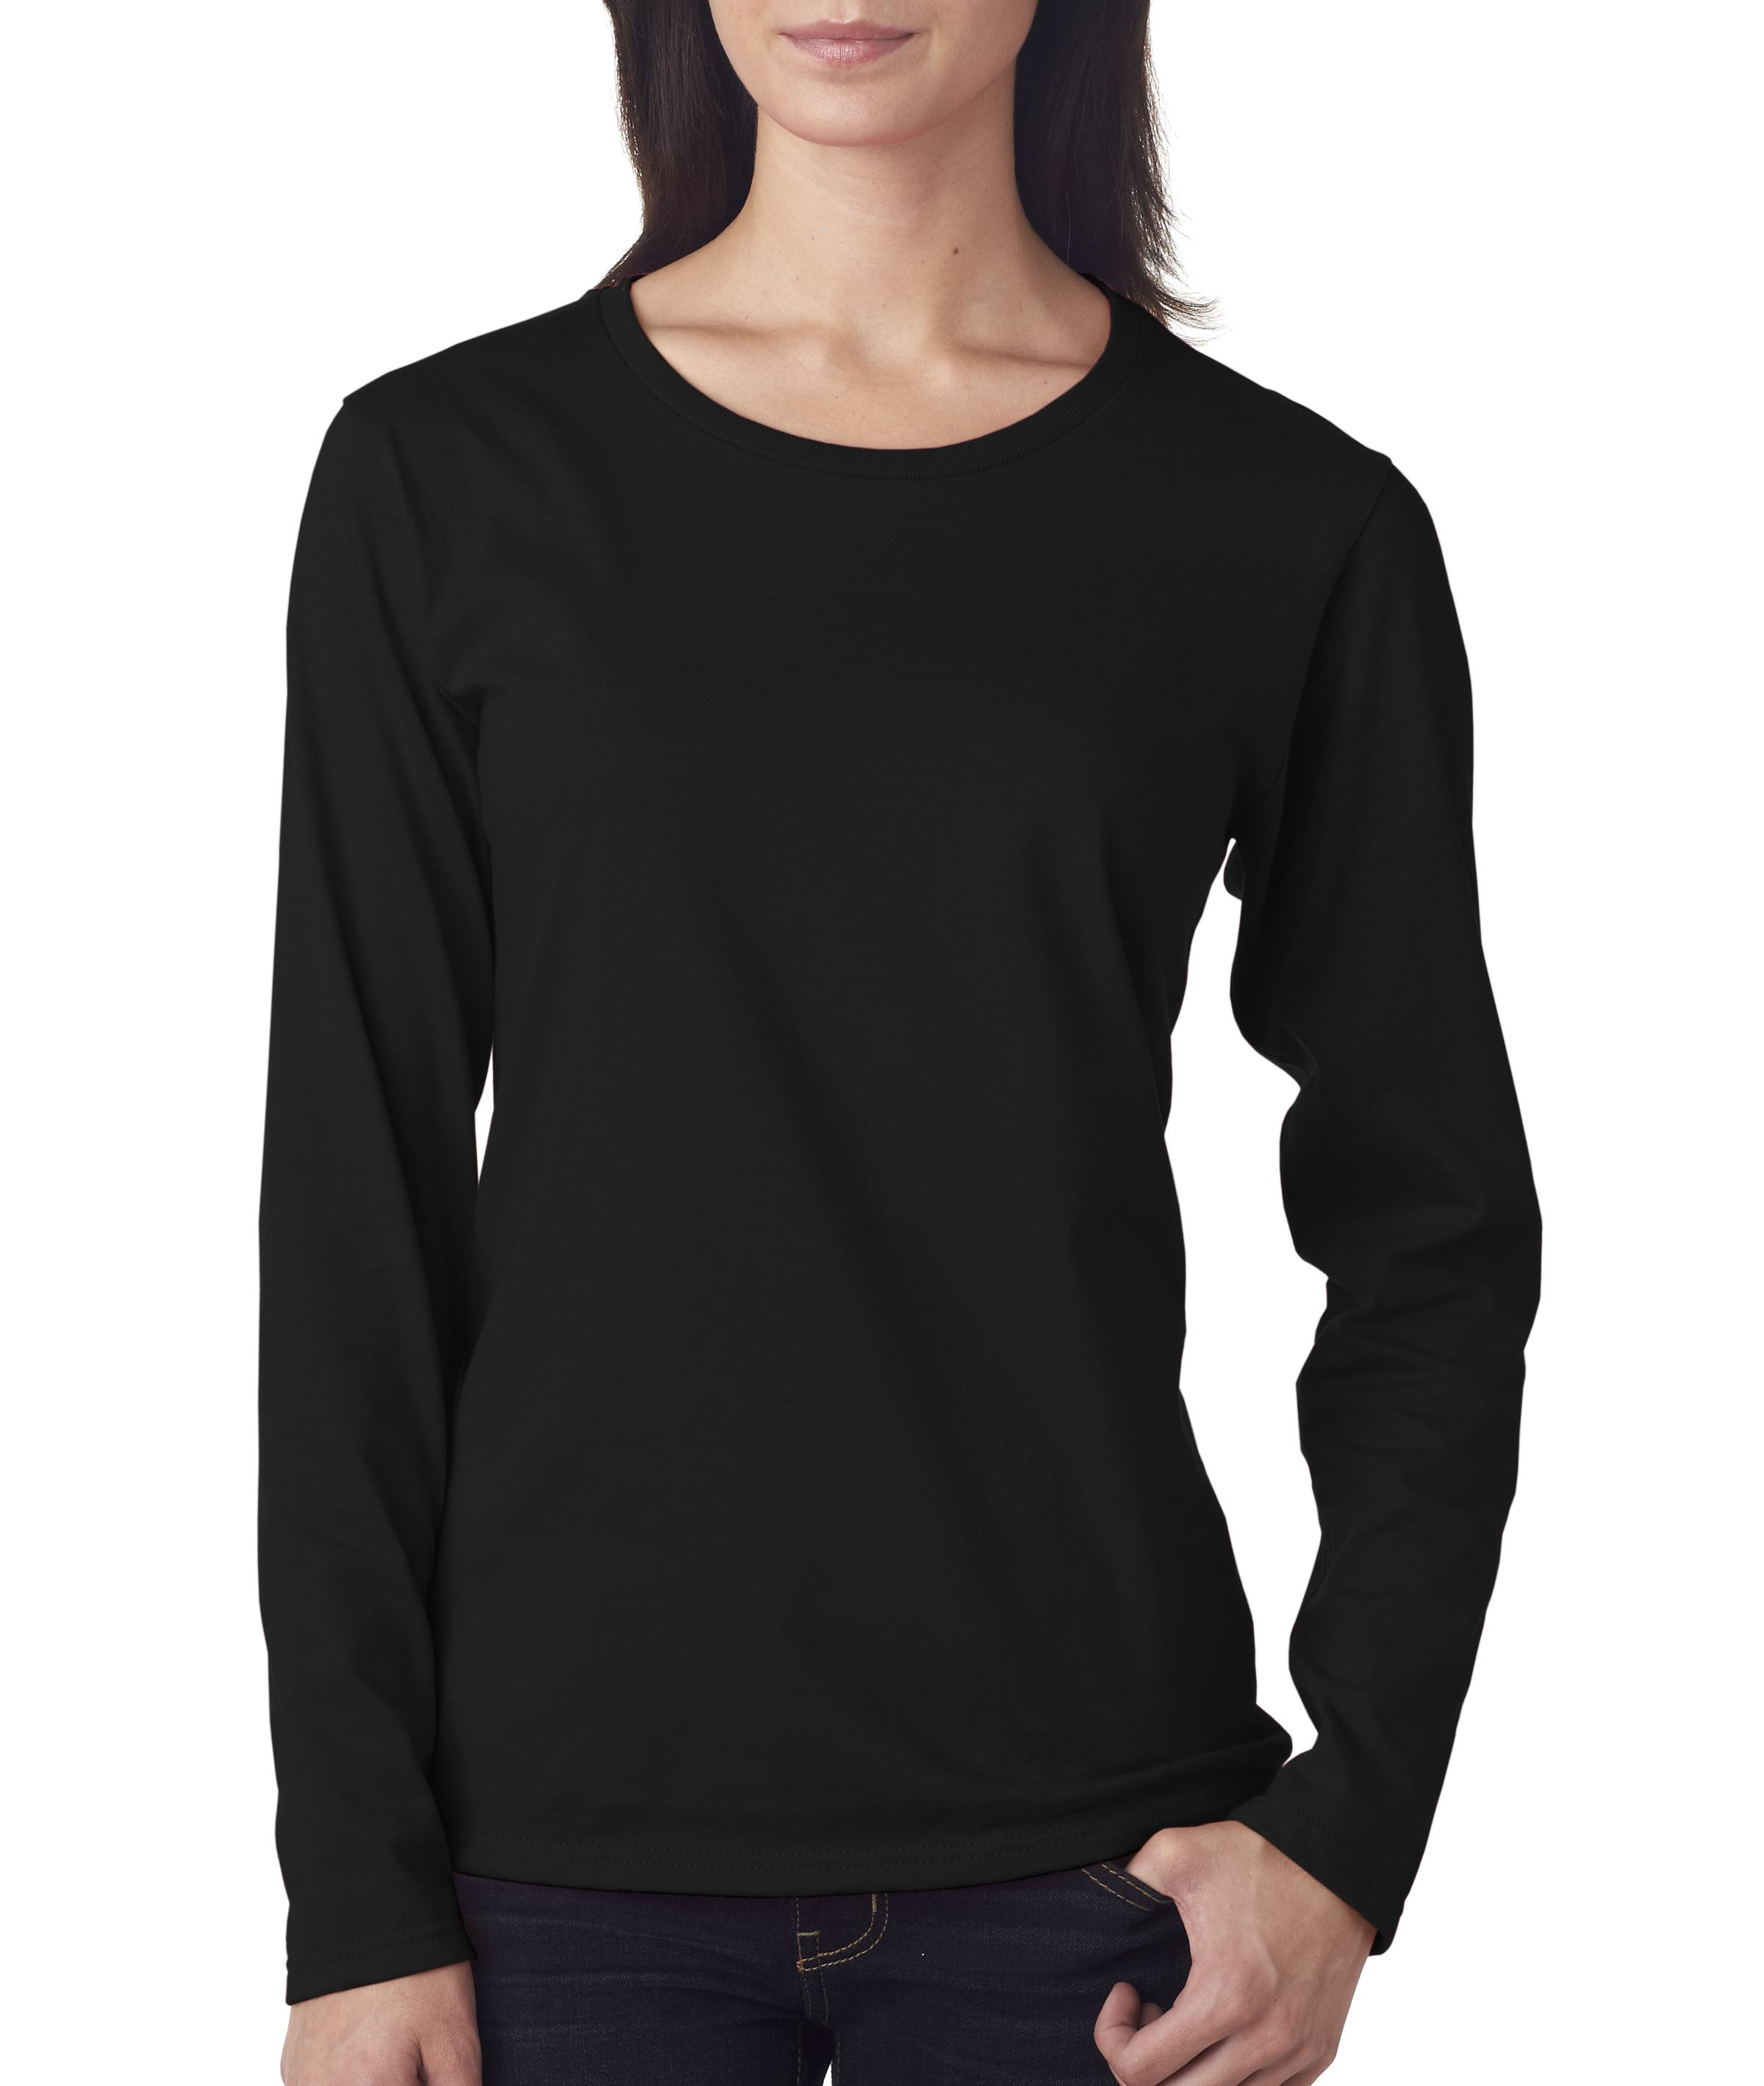 Anvil Ladies' Lightweight Long Sleeve T-Shirt